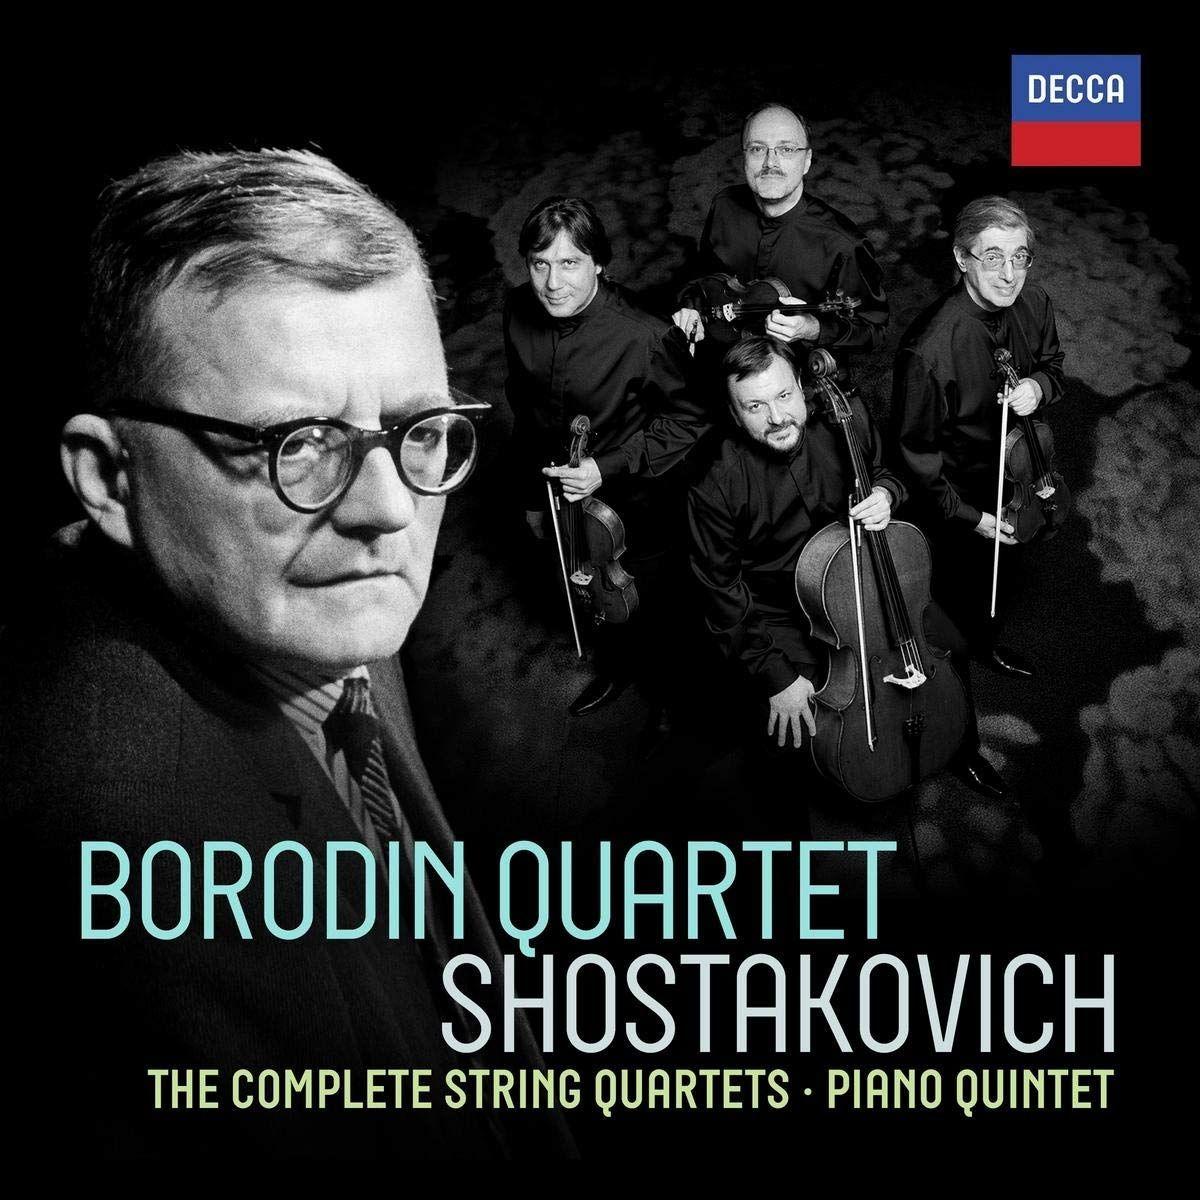 Фото - Дмитрий Шостакович Borodin Quartet. Shostakovich. Complete String Quartets фрезы no 10 1 5 3 175 cnc pcb xd1 5 3 175ti